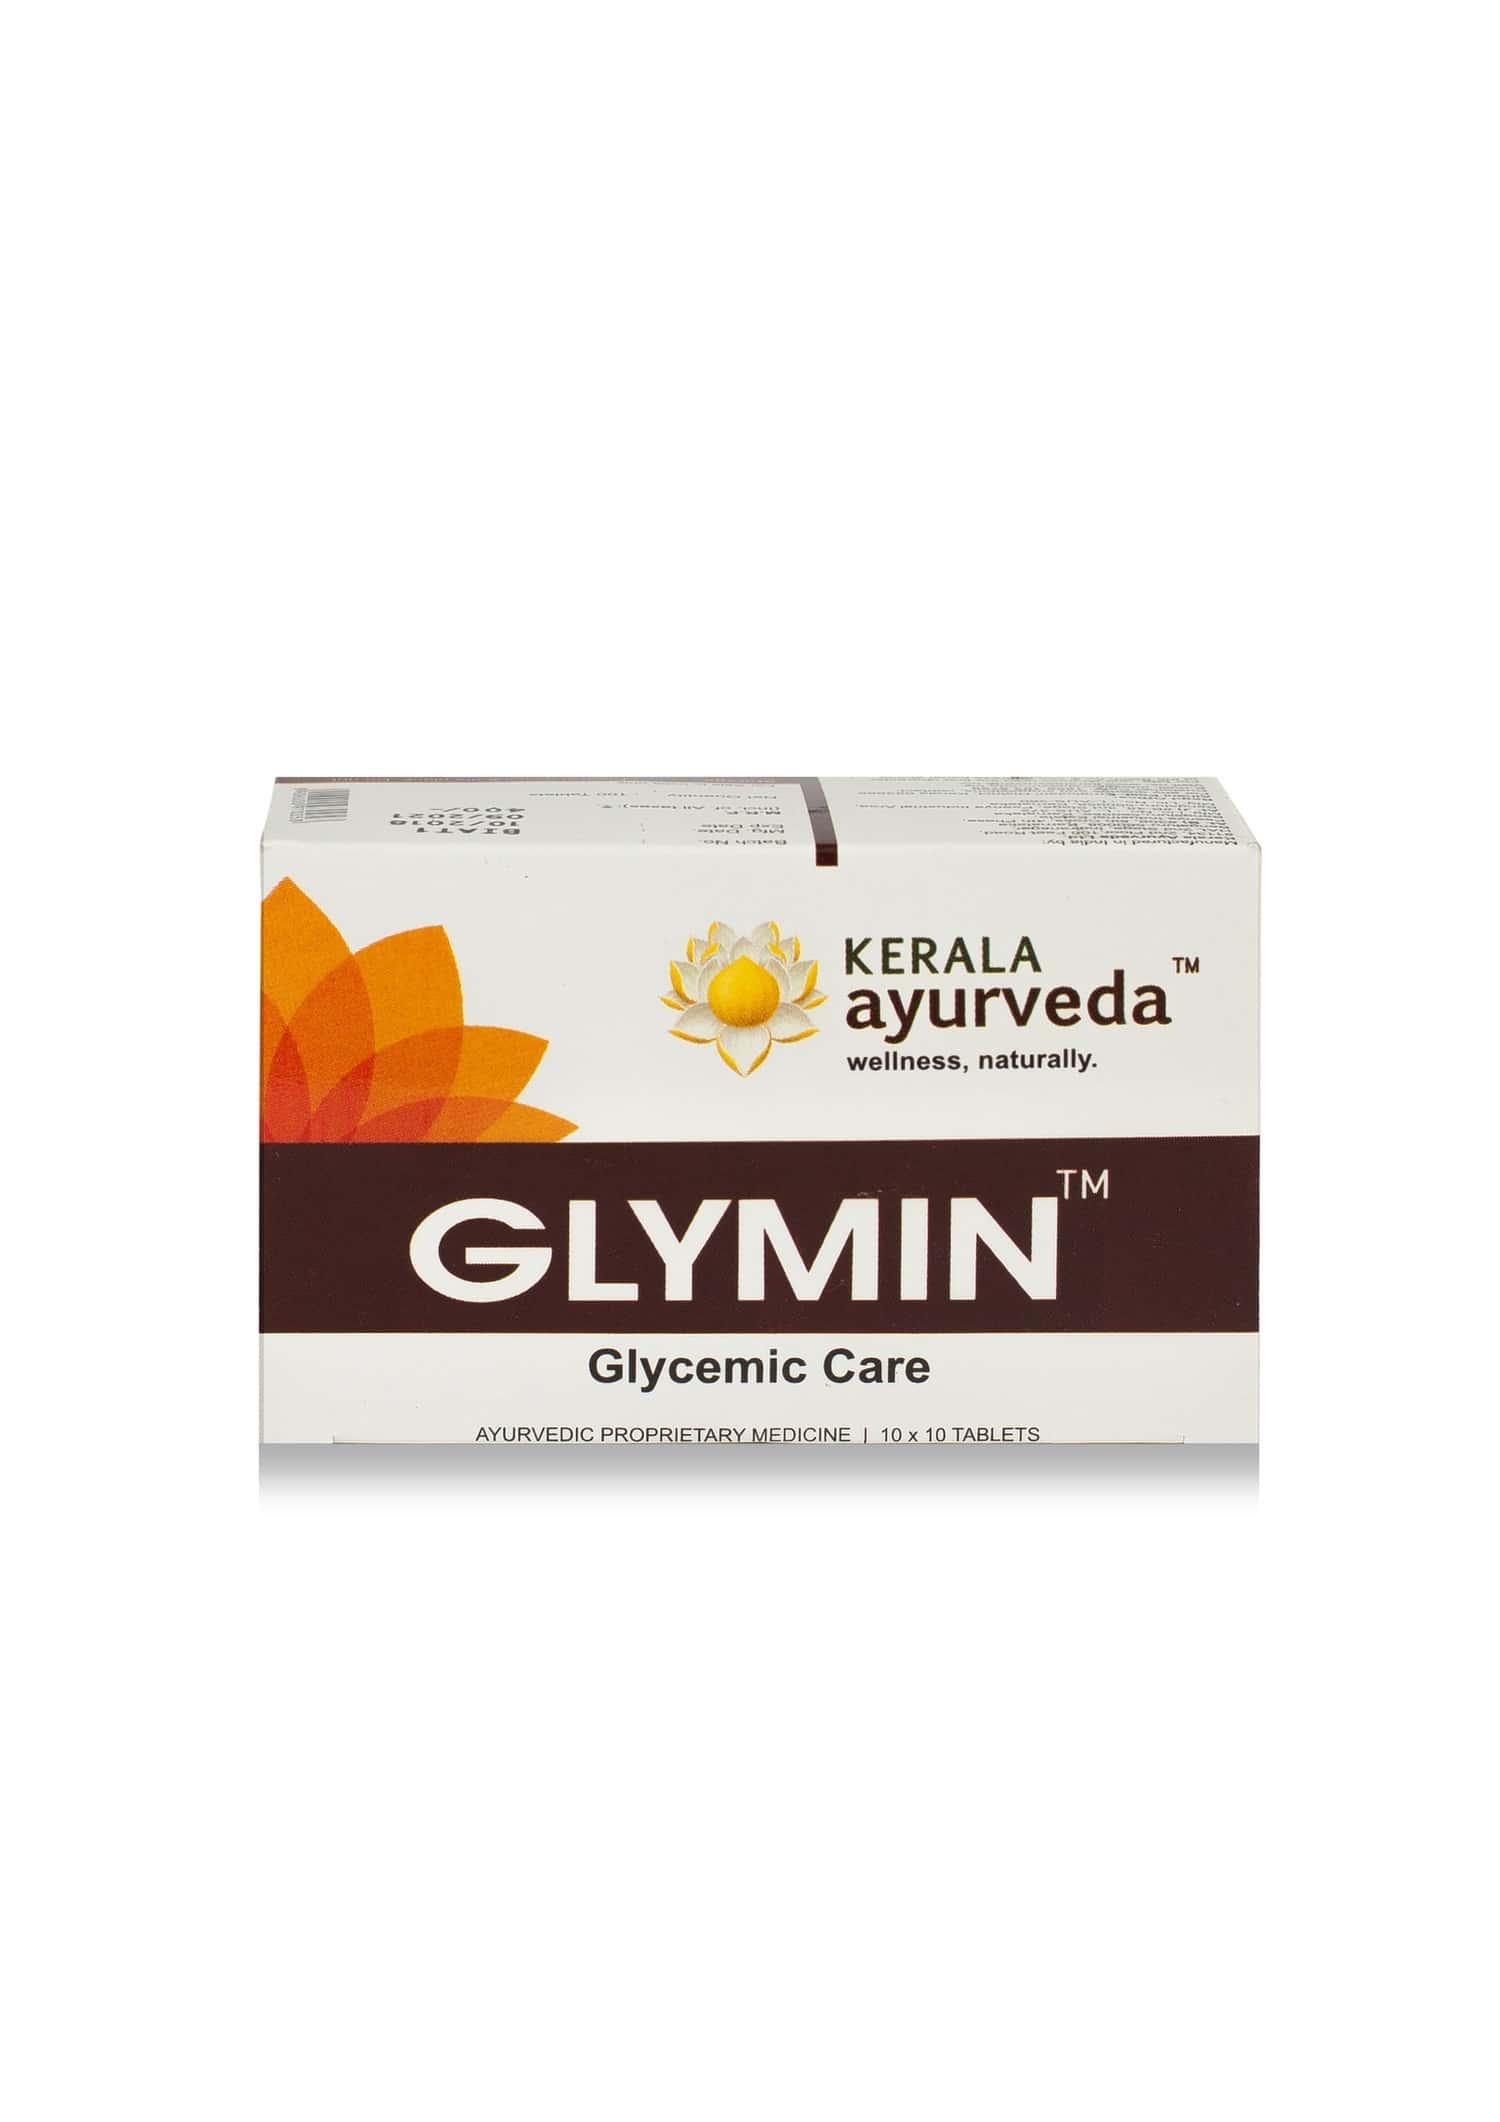 Kerala Ayurveda Glymin Glucose Control Tablets Box Of 100 's